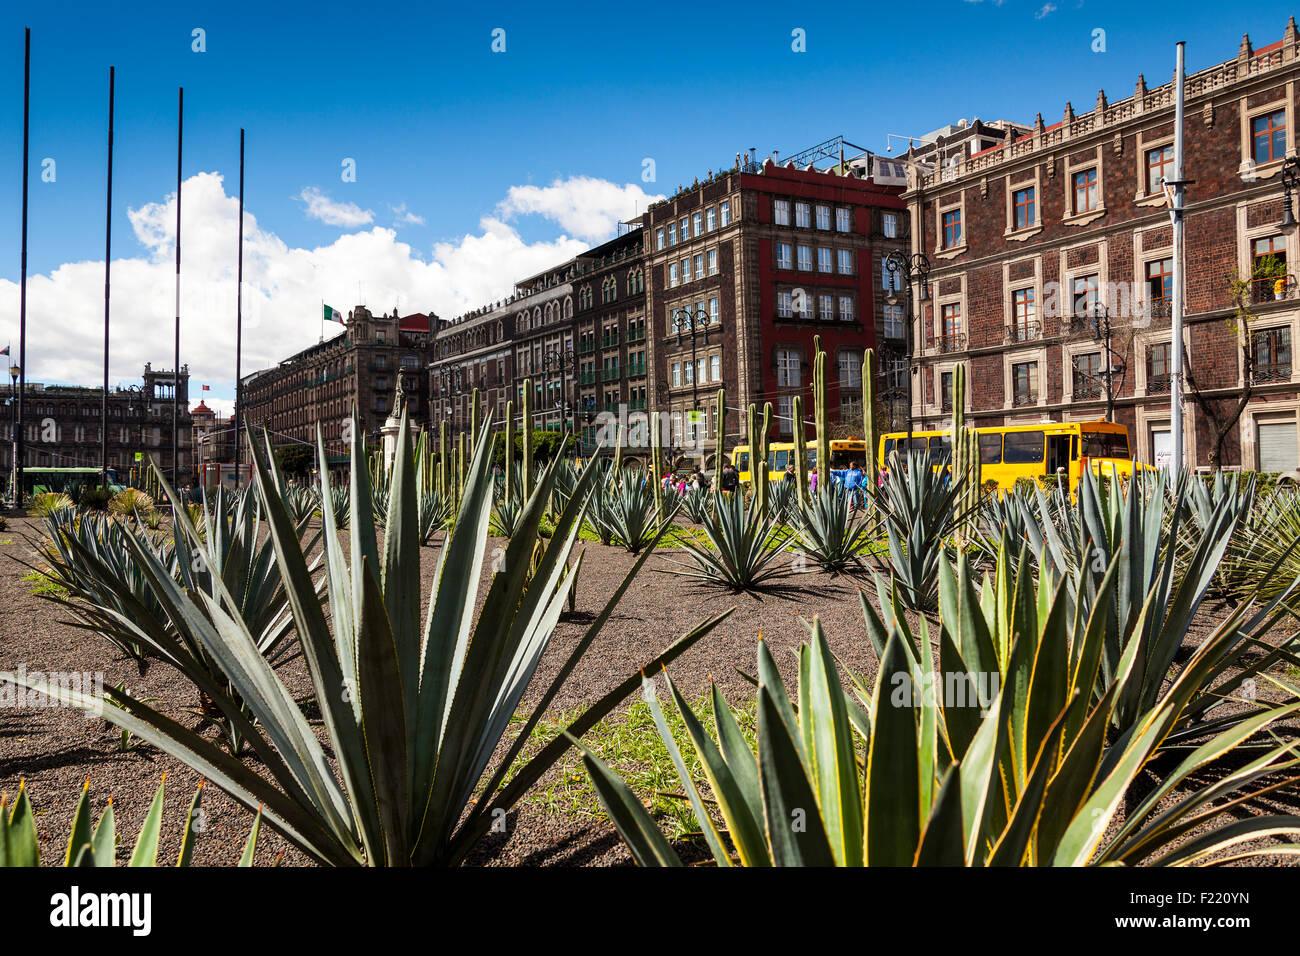 Agave garden Zocalo square Mexico City Federal District DF North America - Stock Image